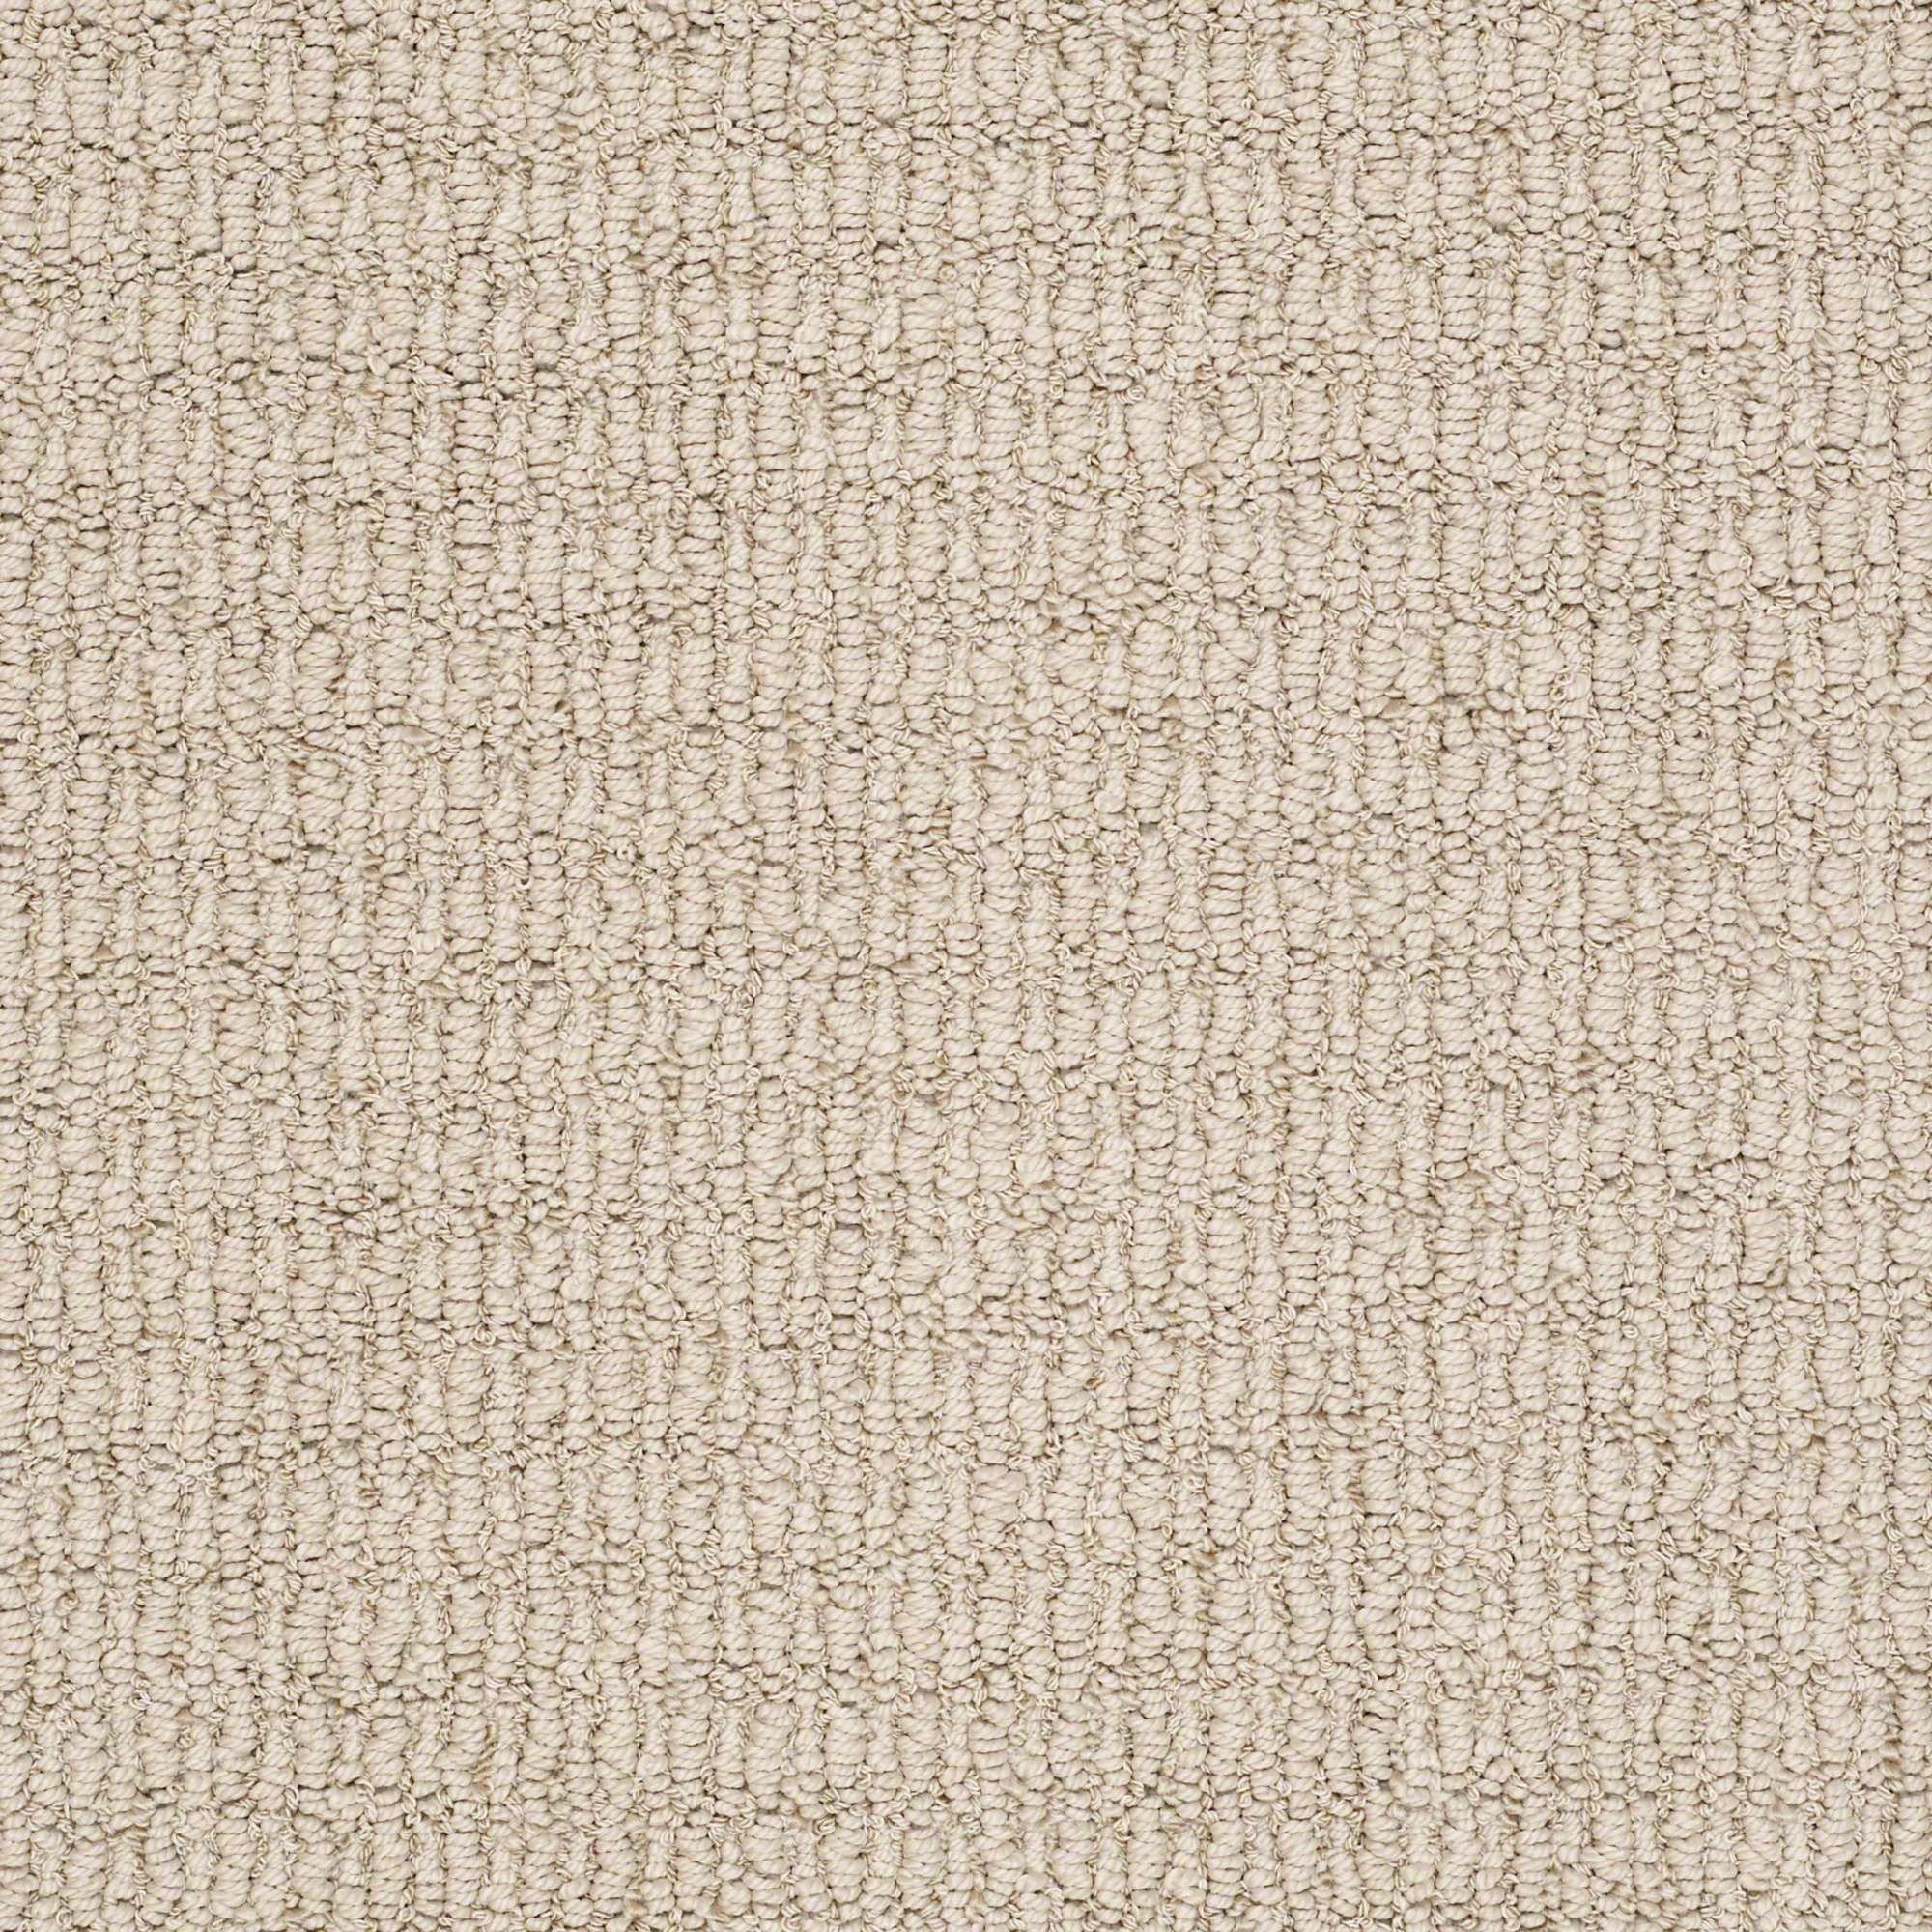 Carpetrunnersmadetosize Carpet Samples Stainmaster Indoor Carpet